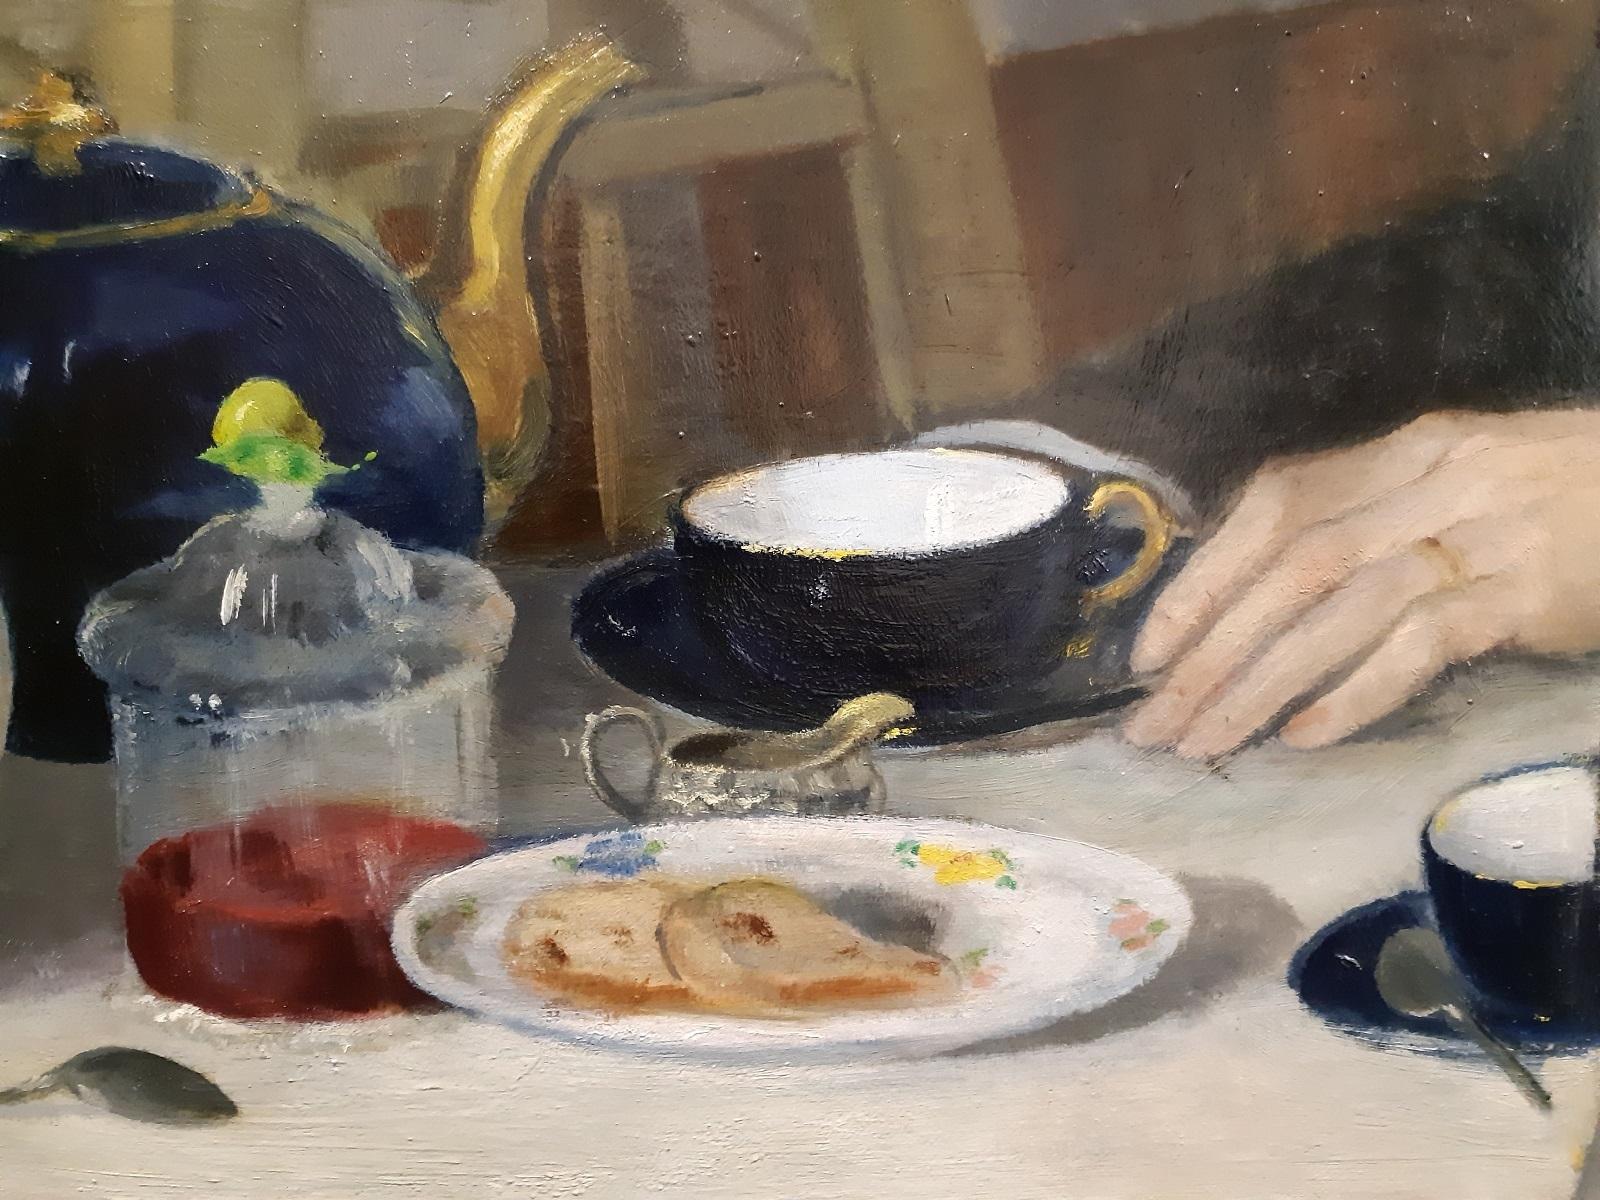 A delicate detail of Morelli's breakfast scene